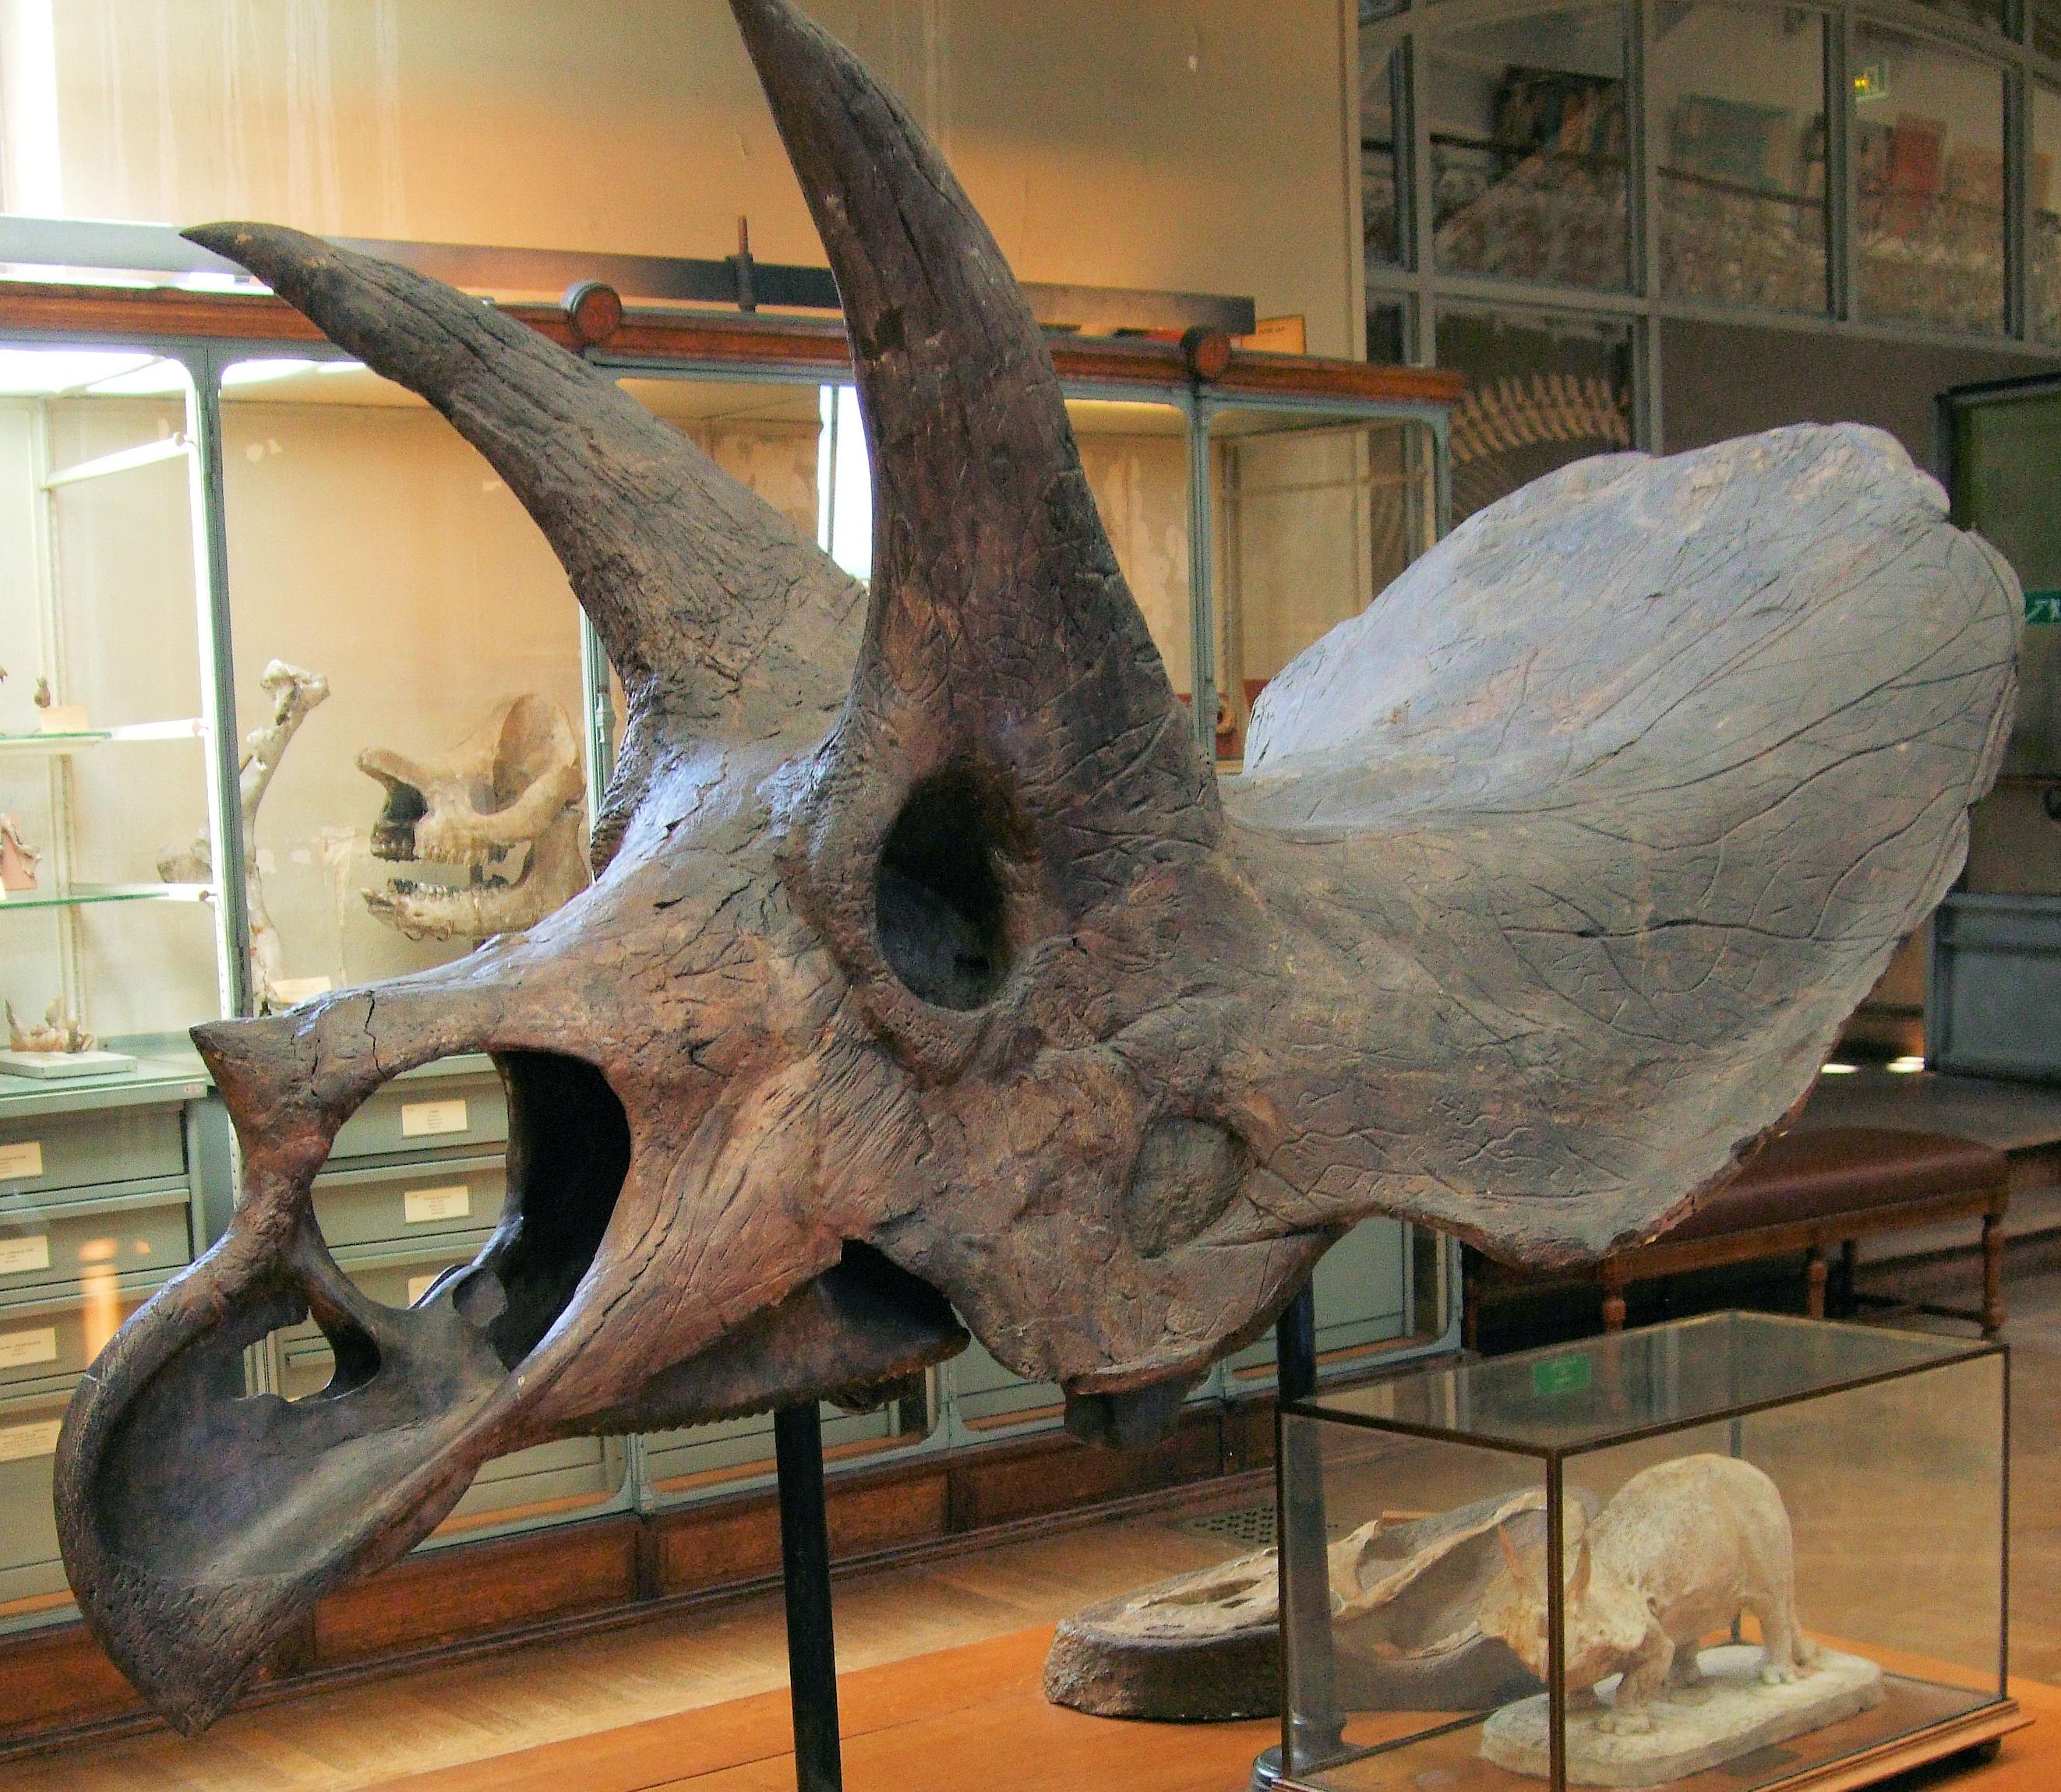 file triceratops horridus skull in the gallery of paleontology